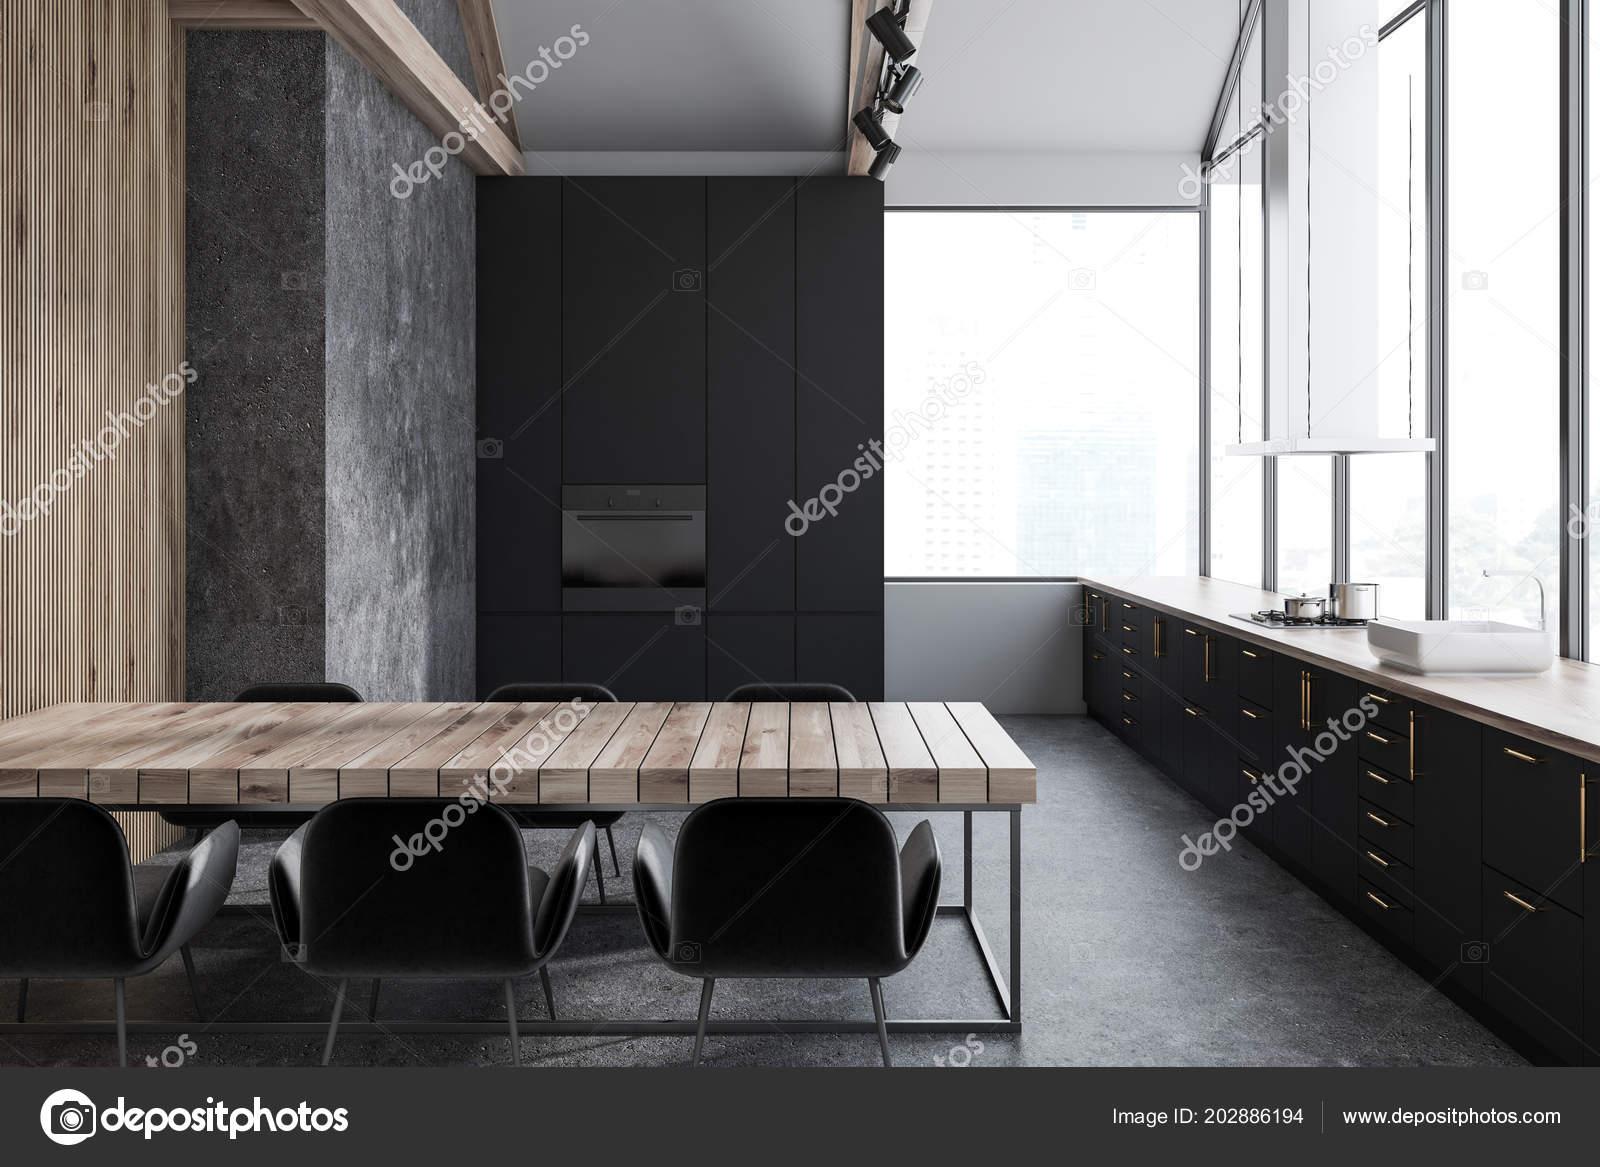 concrete kitchen table under mount sinks 狭窄的白色和混凝土厨房内部与混凝土地板黑色台面和全景窗口有椅子的长 狭窄的白色和混凝土厨房内部与混凝土地板 黑色台面和全景窗口 有椅子的长桌子 3d 渲染模拟 照片作者denisismagilov